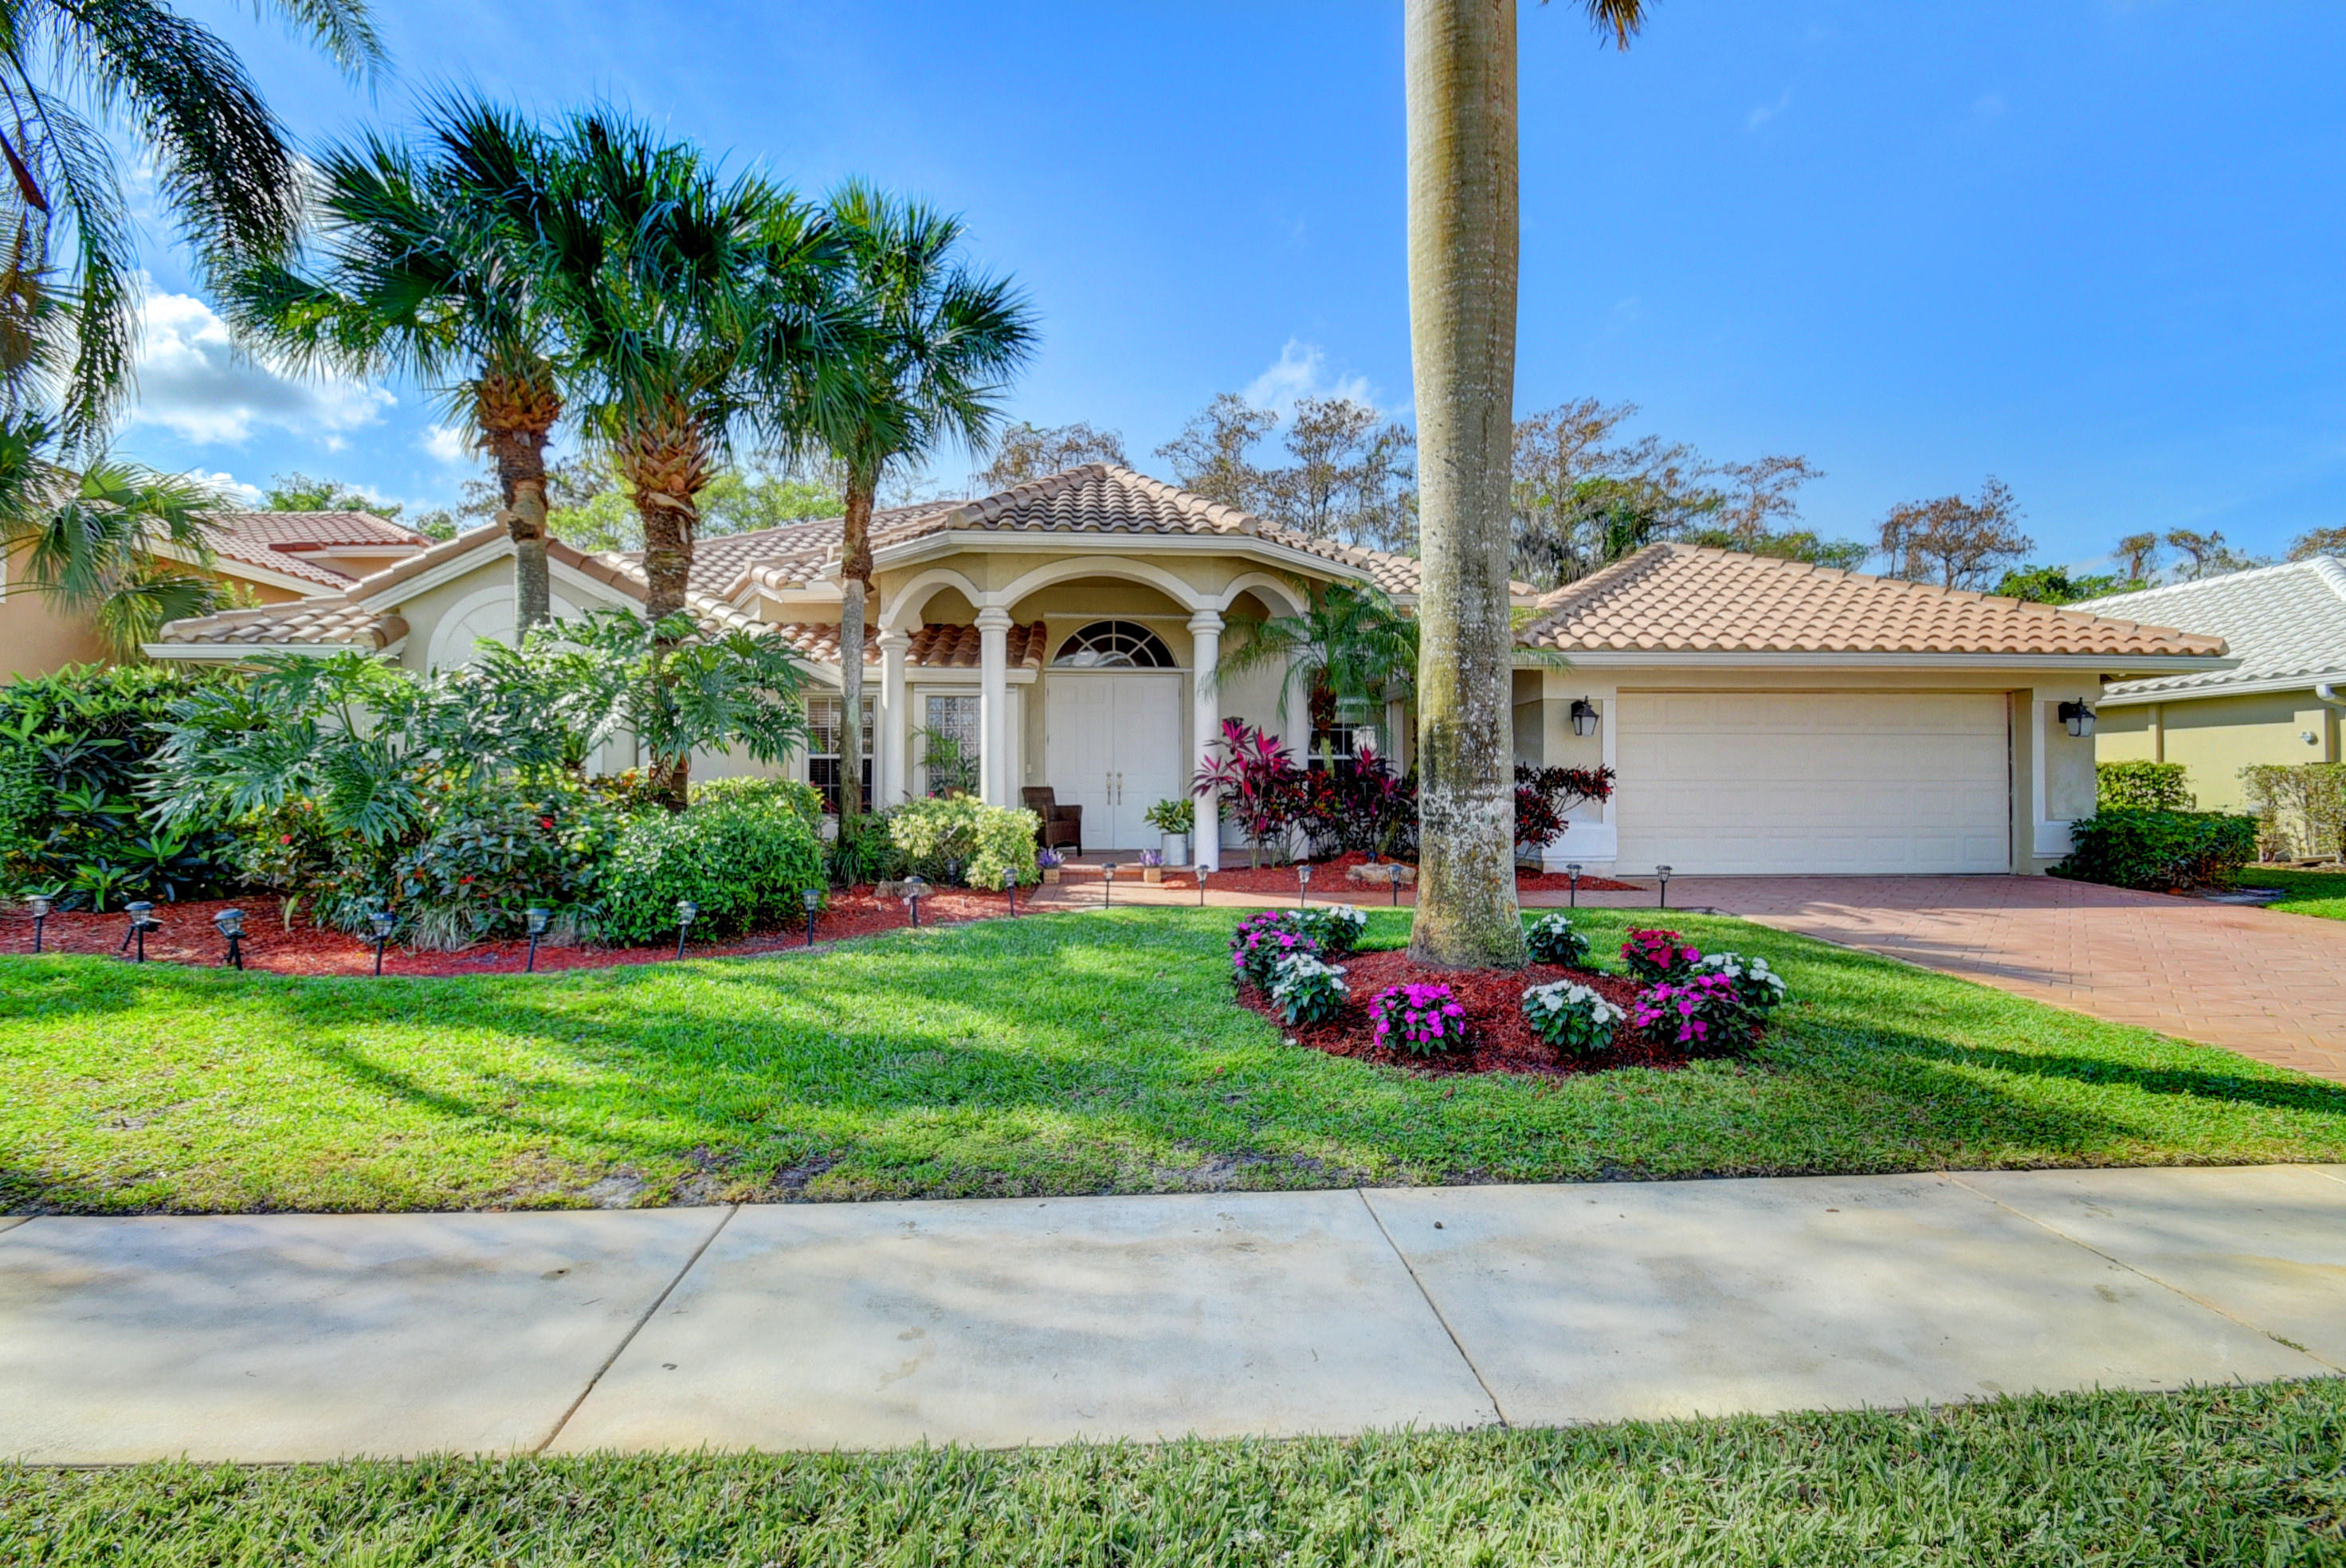 Home for sale in Boca Isles/boca Isles North Boca Raton Florida